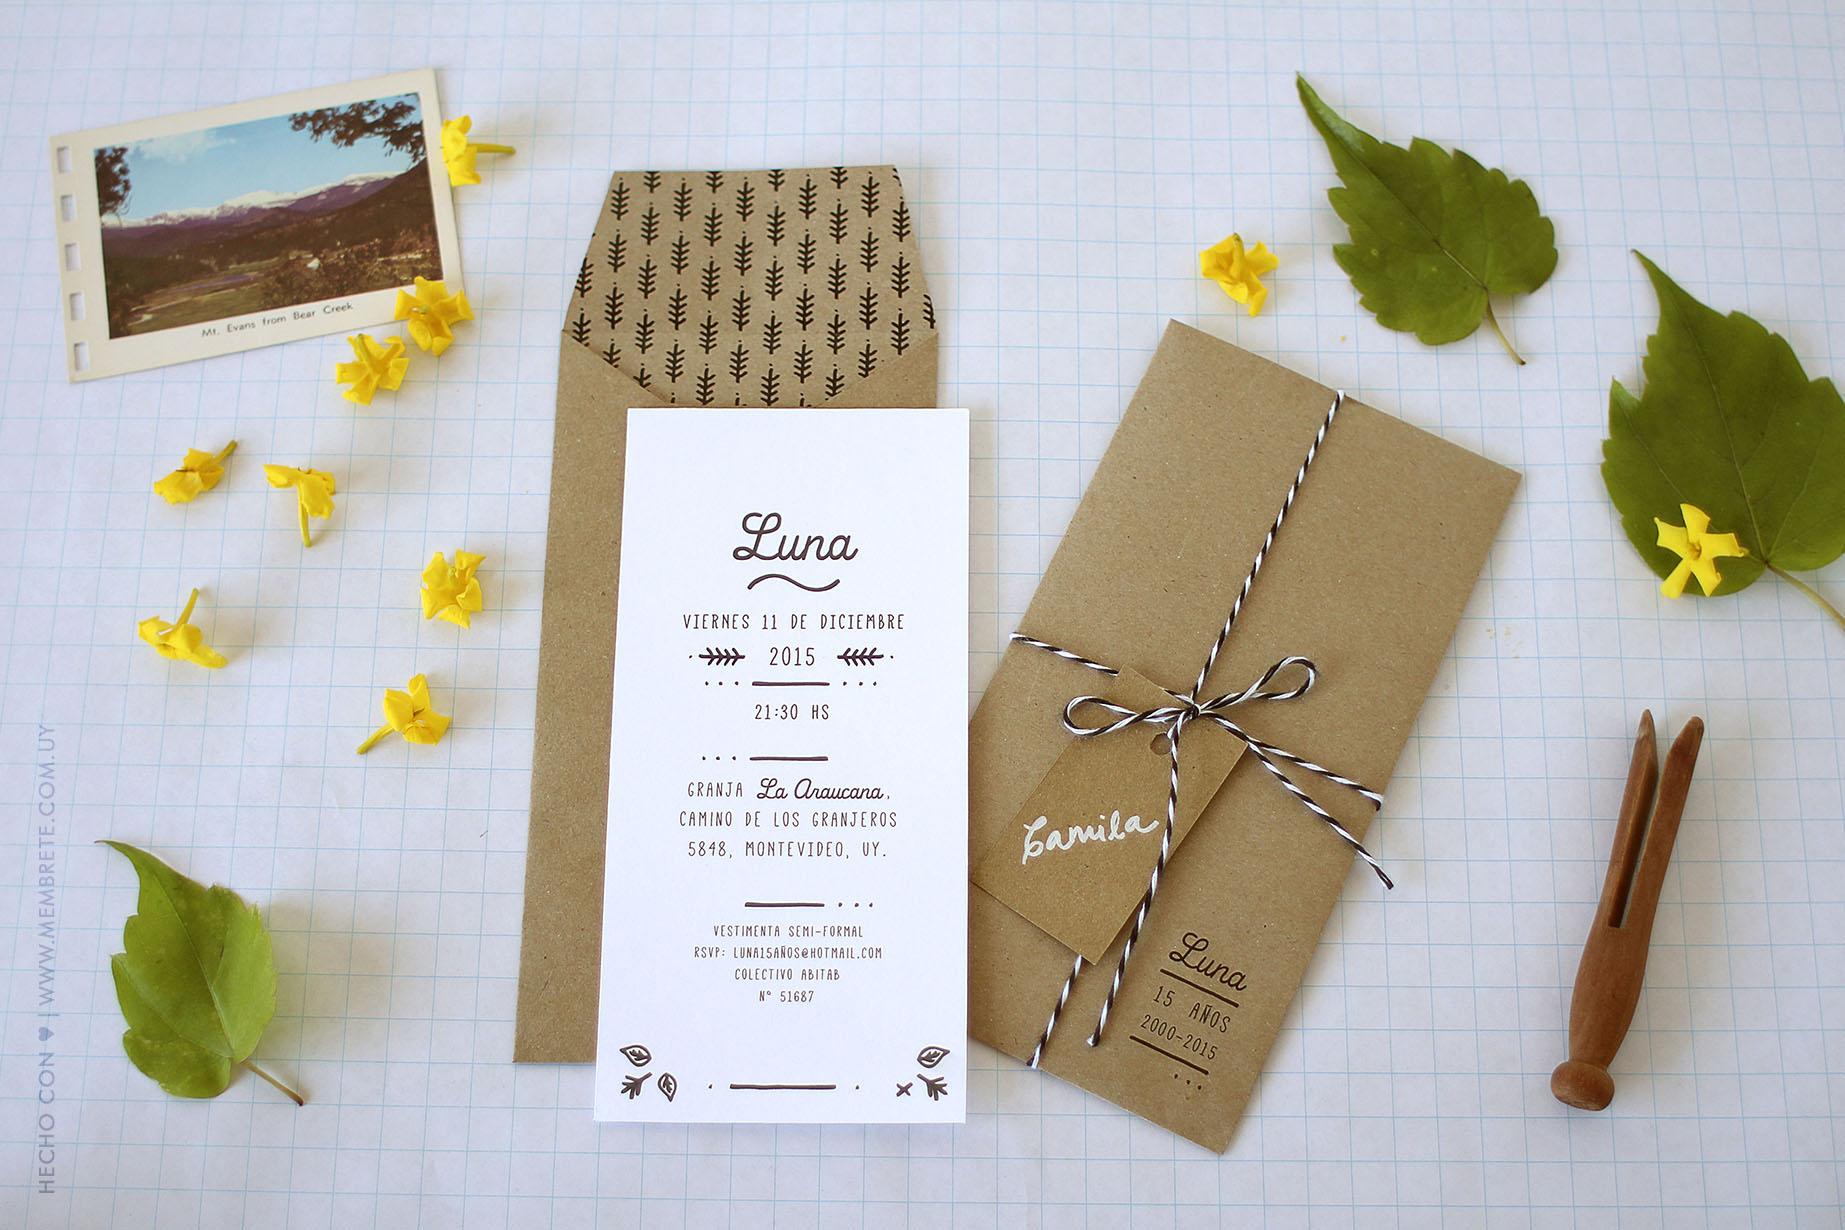 Luna ♪ Fiesta 15 | Membrete | Invitaciones en papel | www.membrete.com.uy